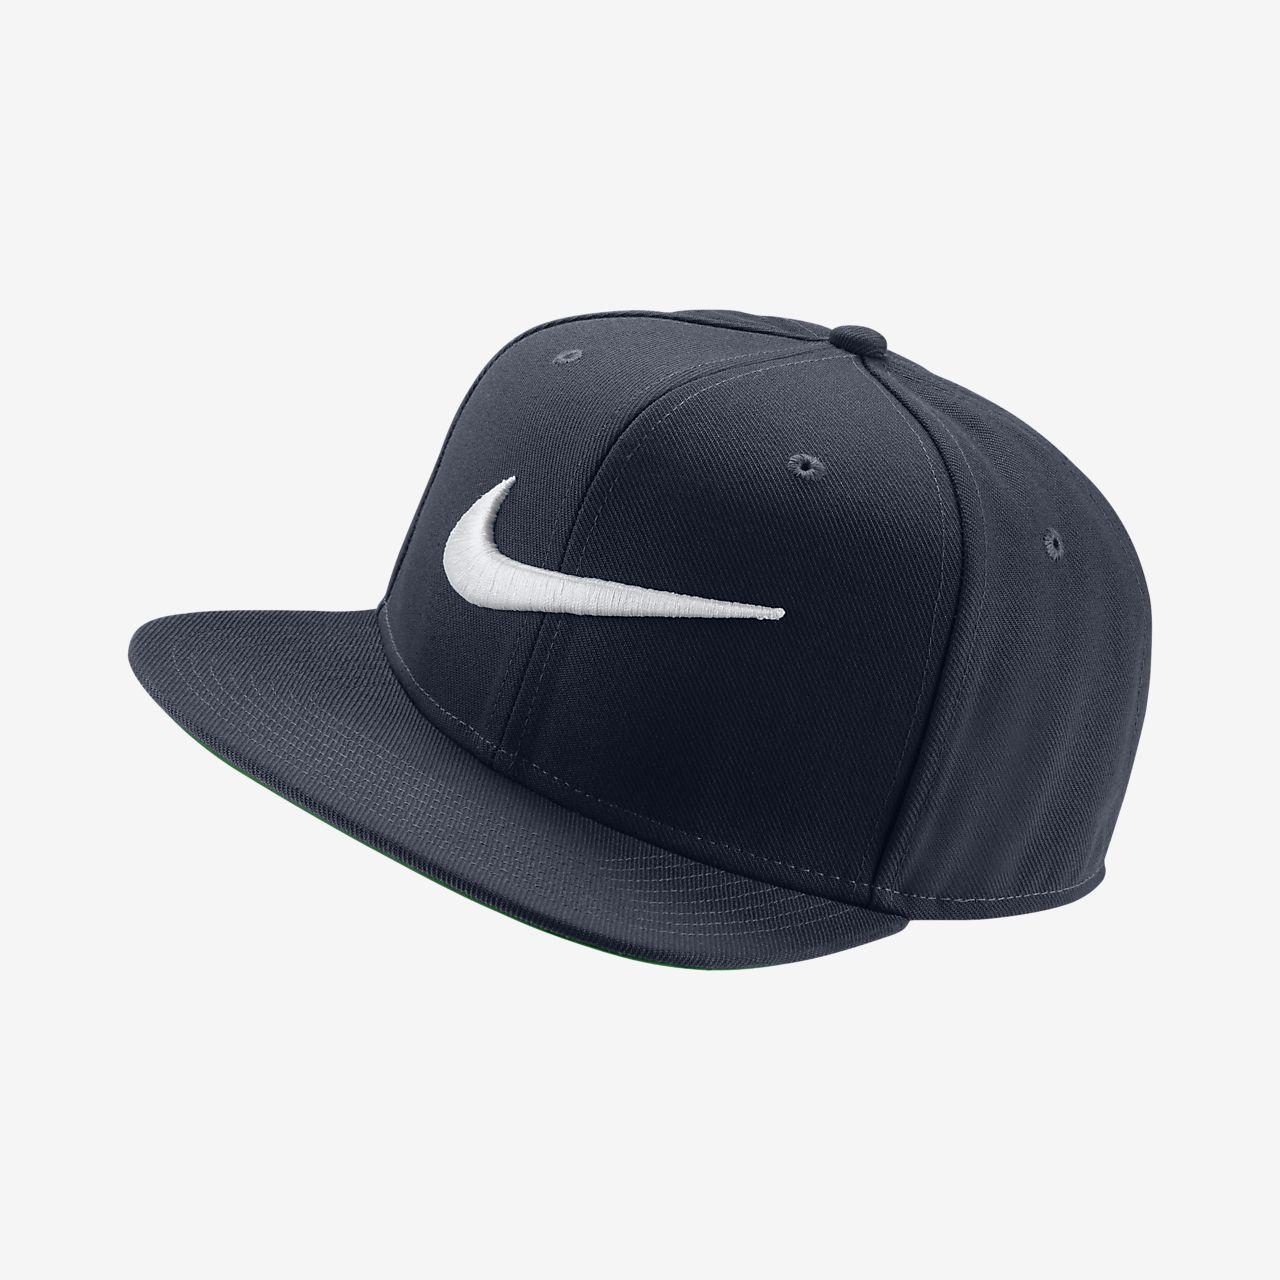 Бейсболка с застежкой Nike Sportswear Pro Swoosh